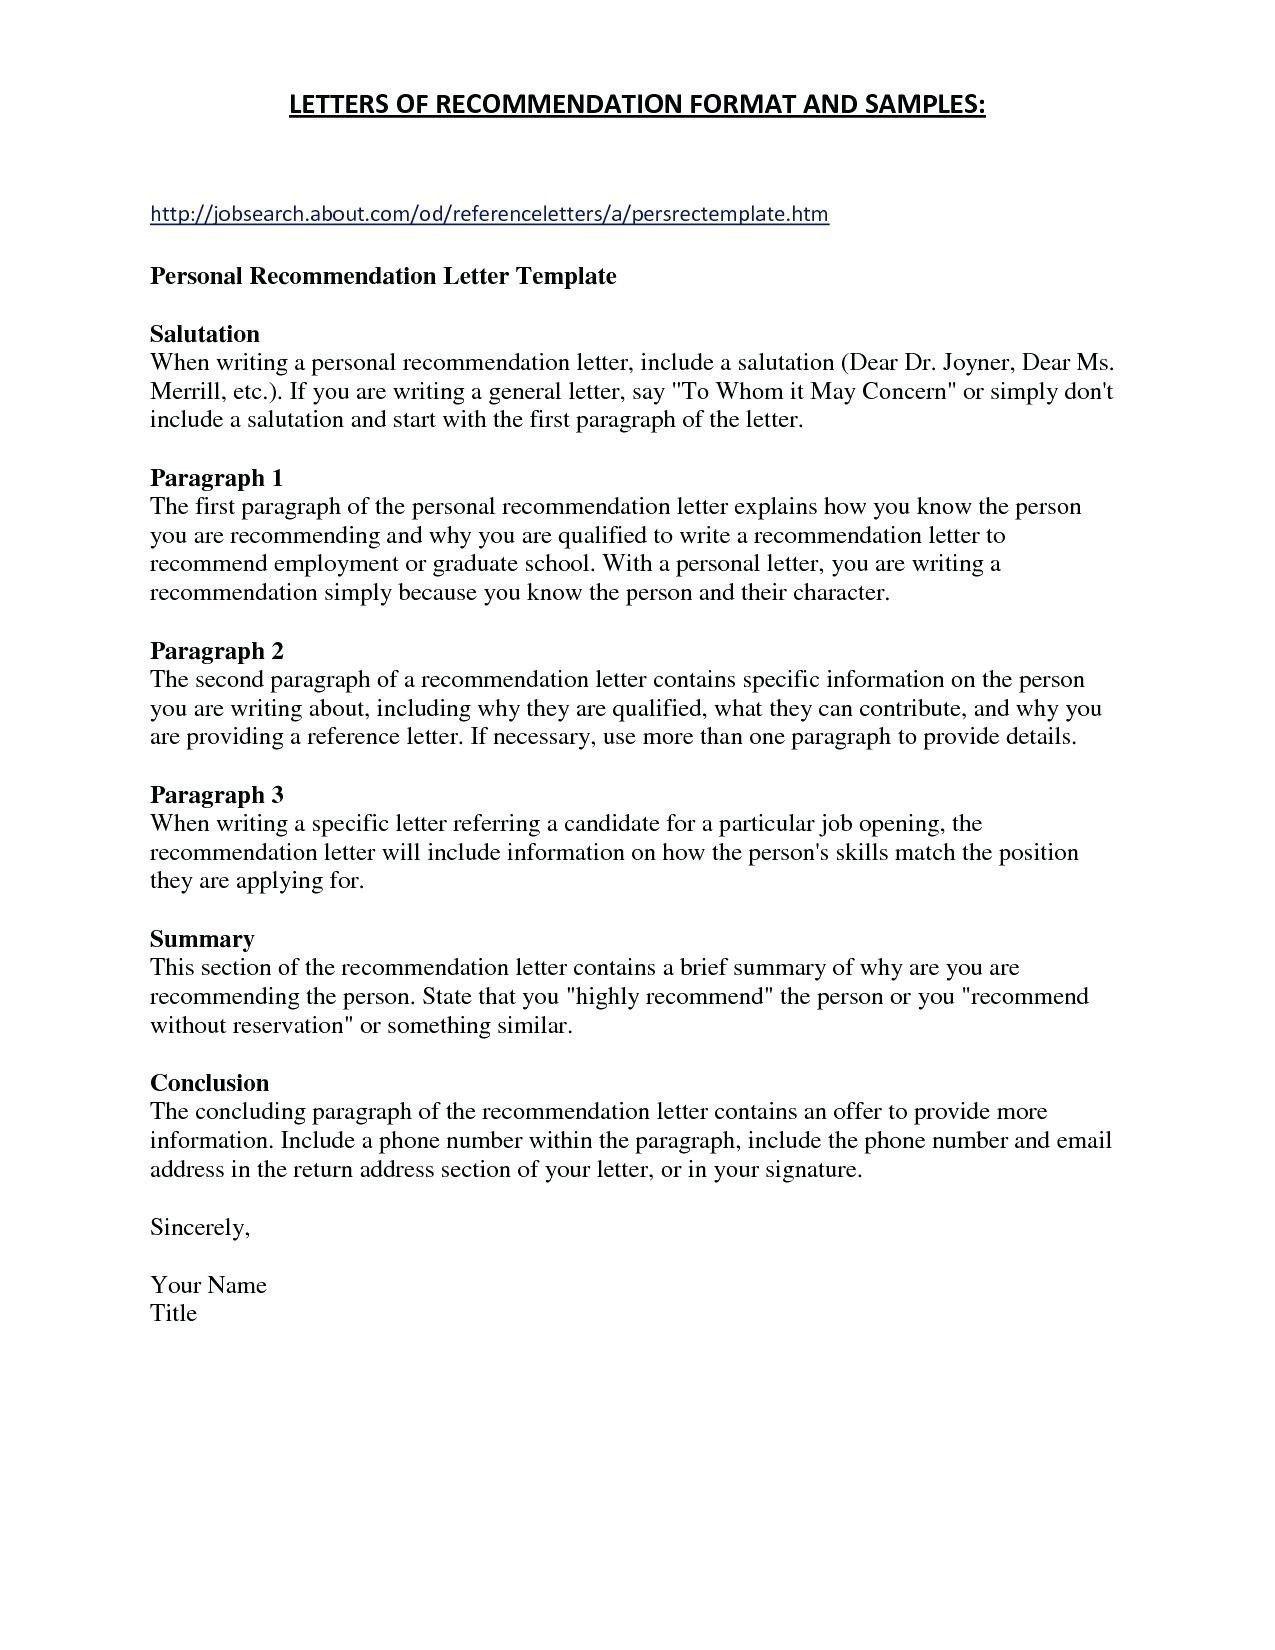 Gym Membership Cancellation Letter In 2021 Cover Letter For Resume Teacher Resume Examples Lettering